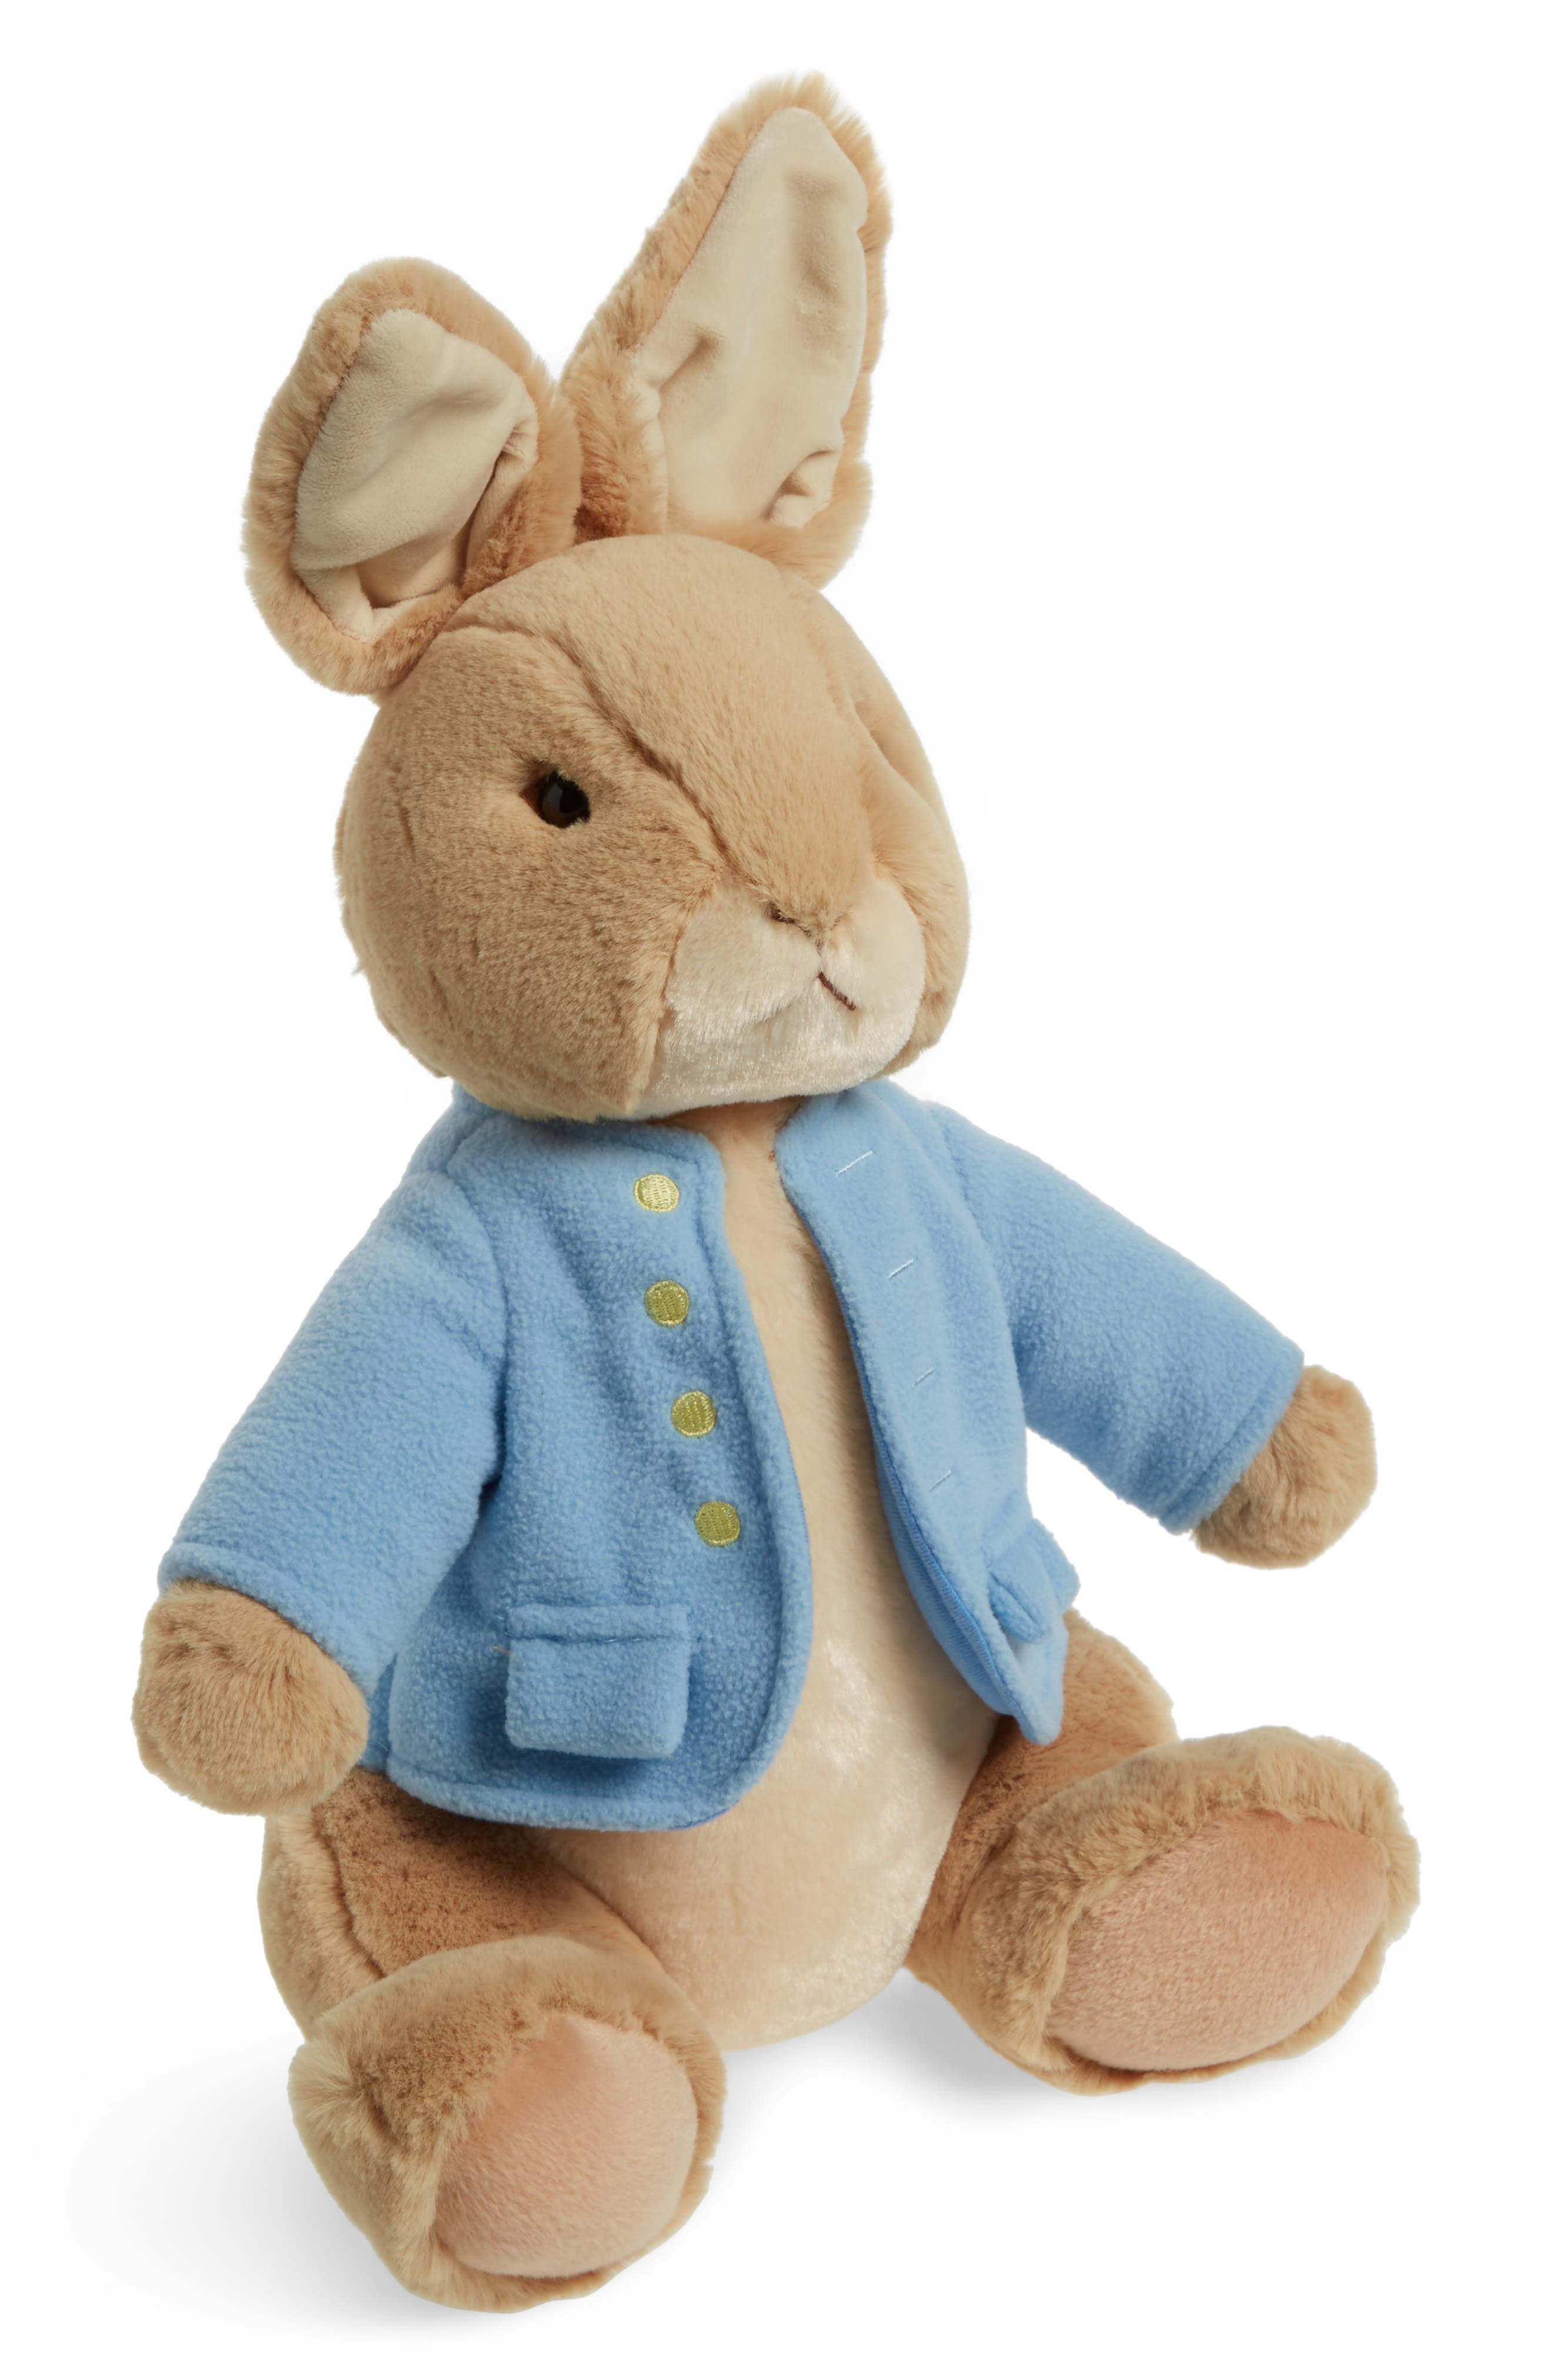 Gund Peter Rabbit Stuffed Animal